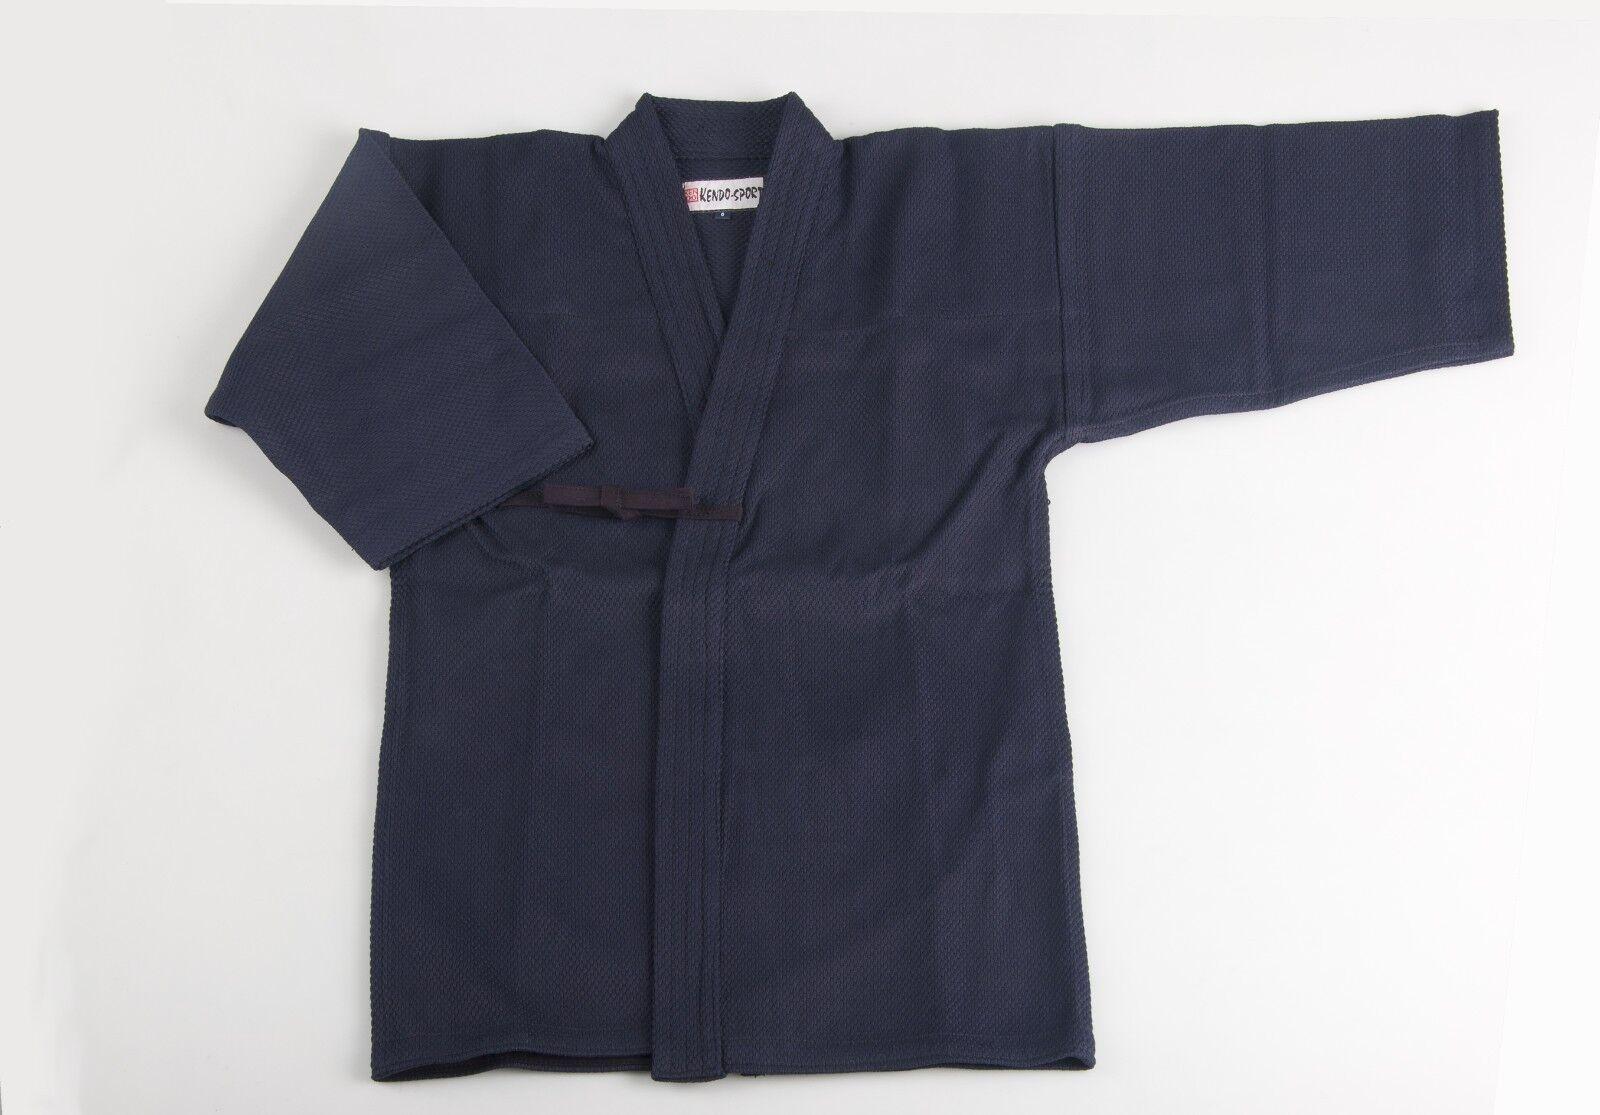 Gi blau Standard für Kendo Iaido Aikido